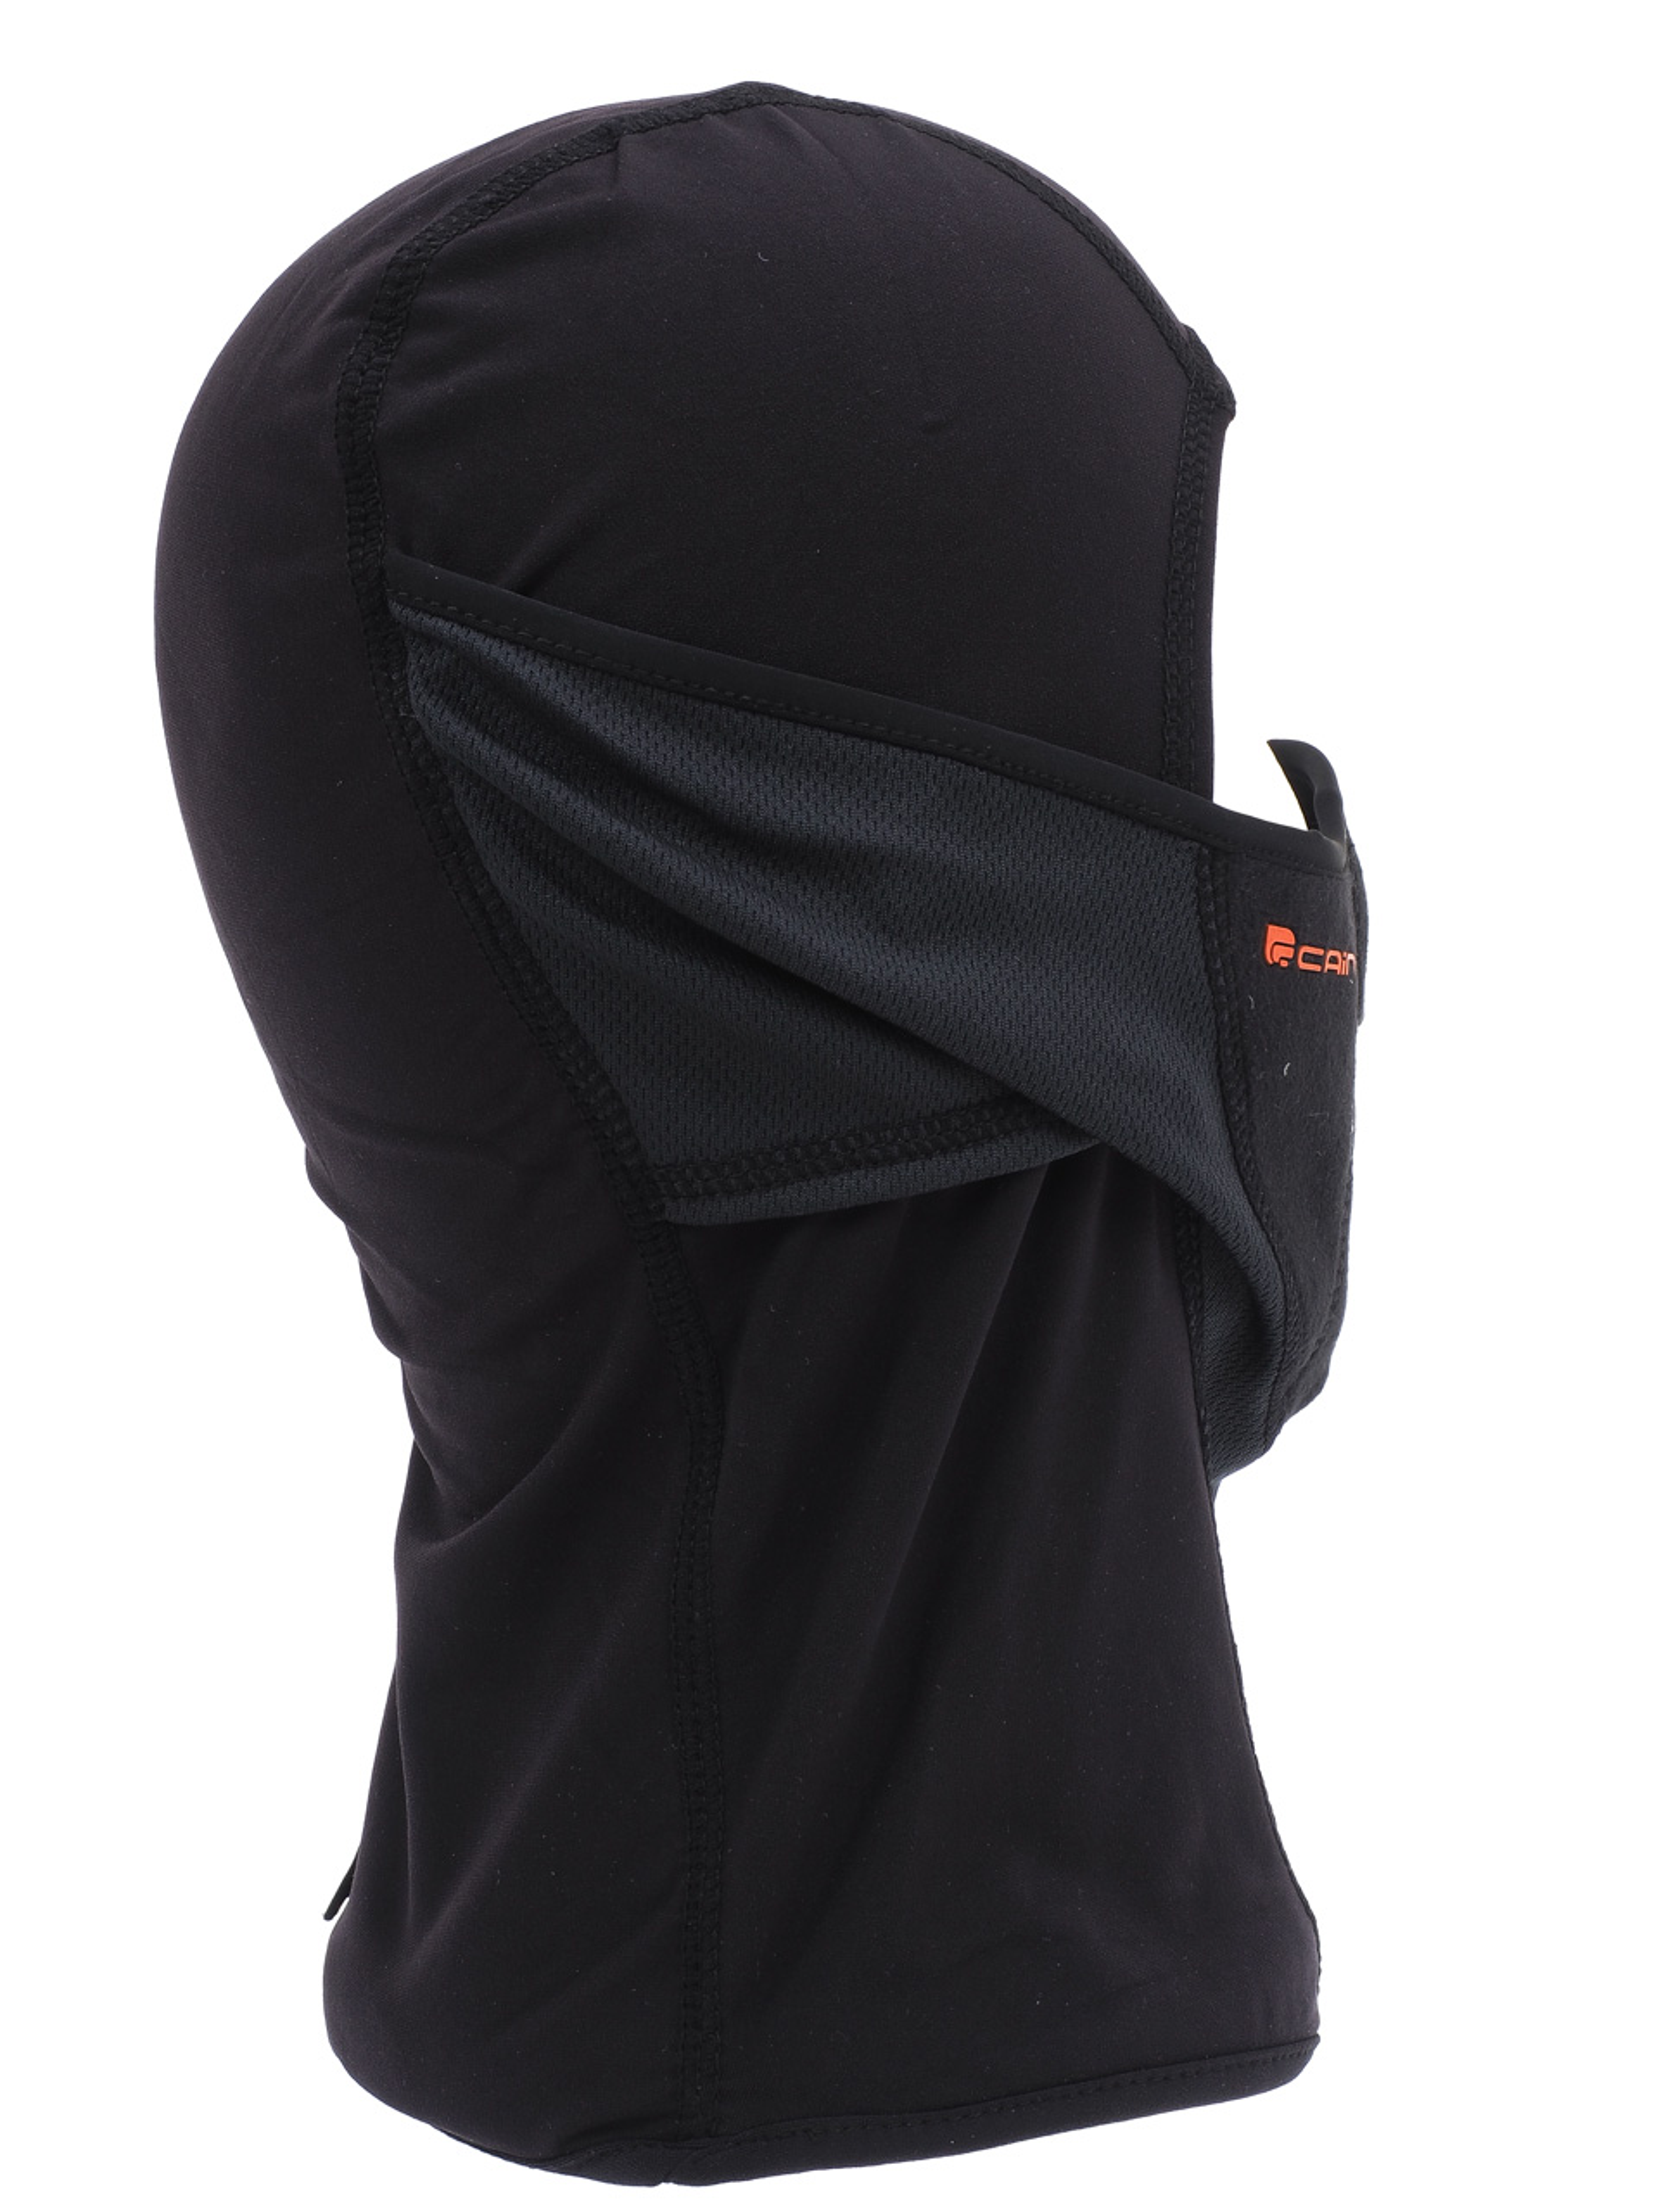 Hood-Winter-Cairn-Jonouchi-Black-Hood-Black-52434-New thumbnail 5